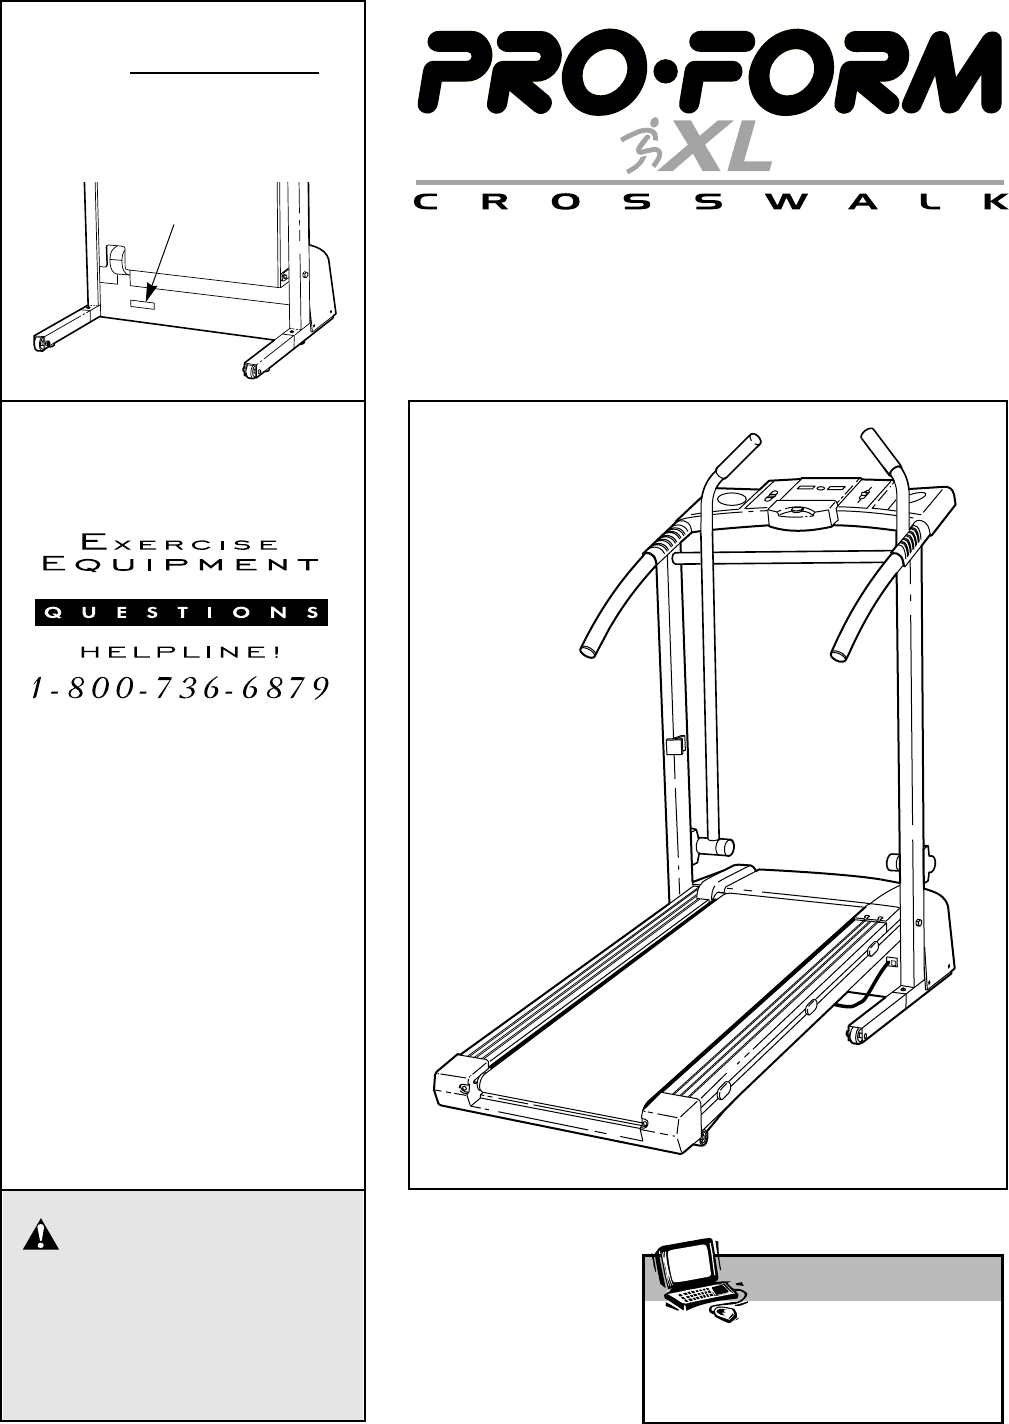 Proform 299216 Crosswalk Xl Treadmill Users Manual